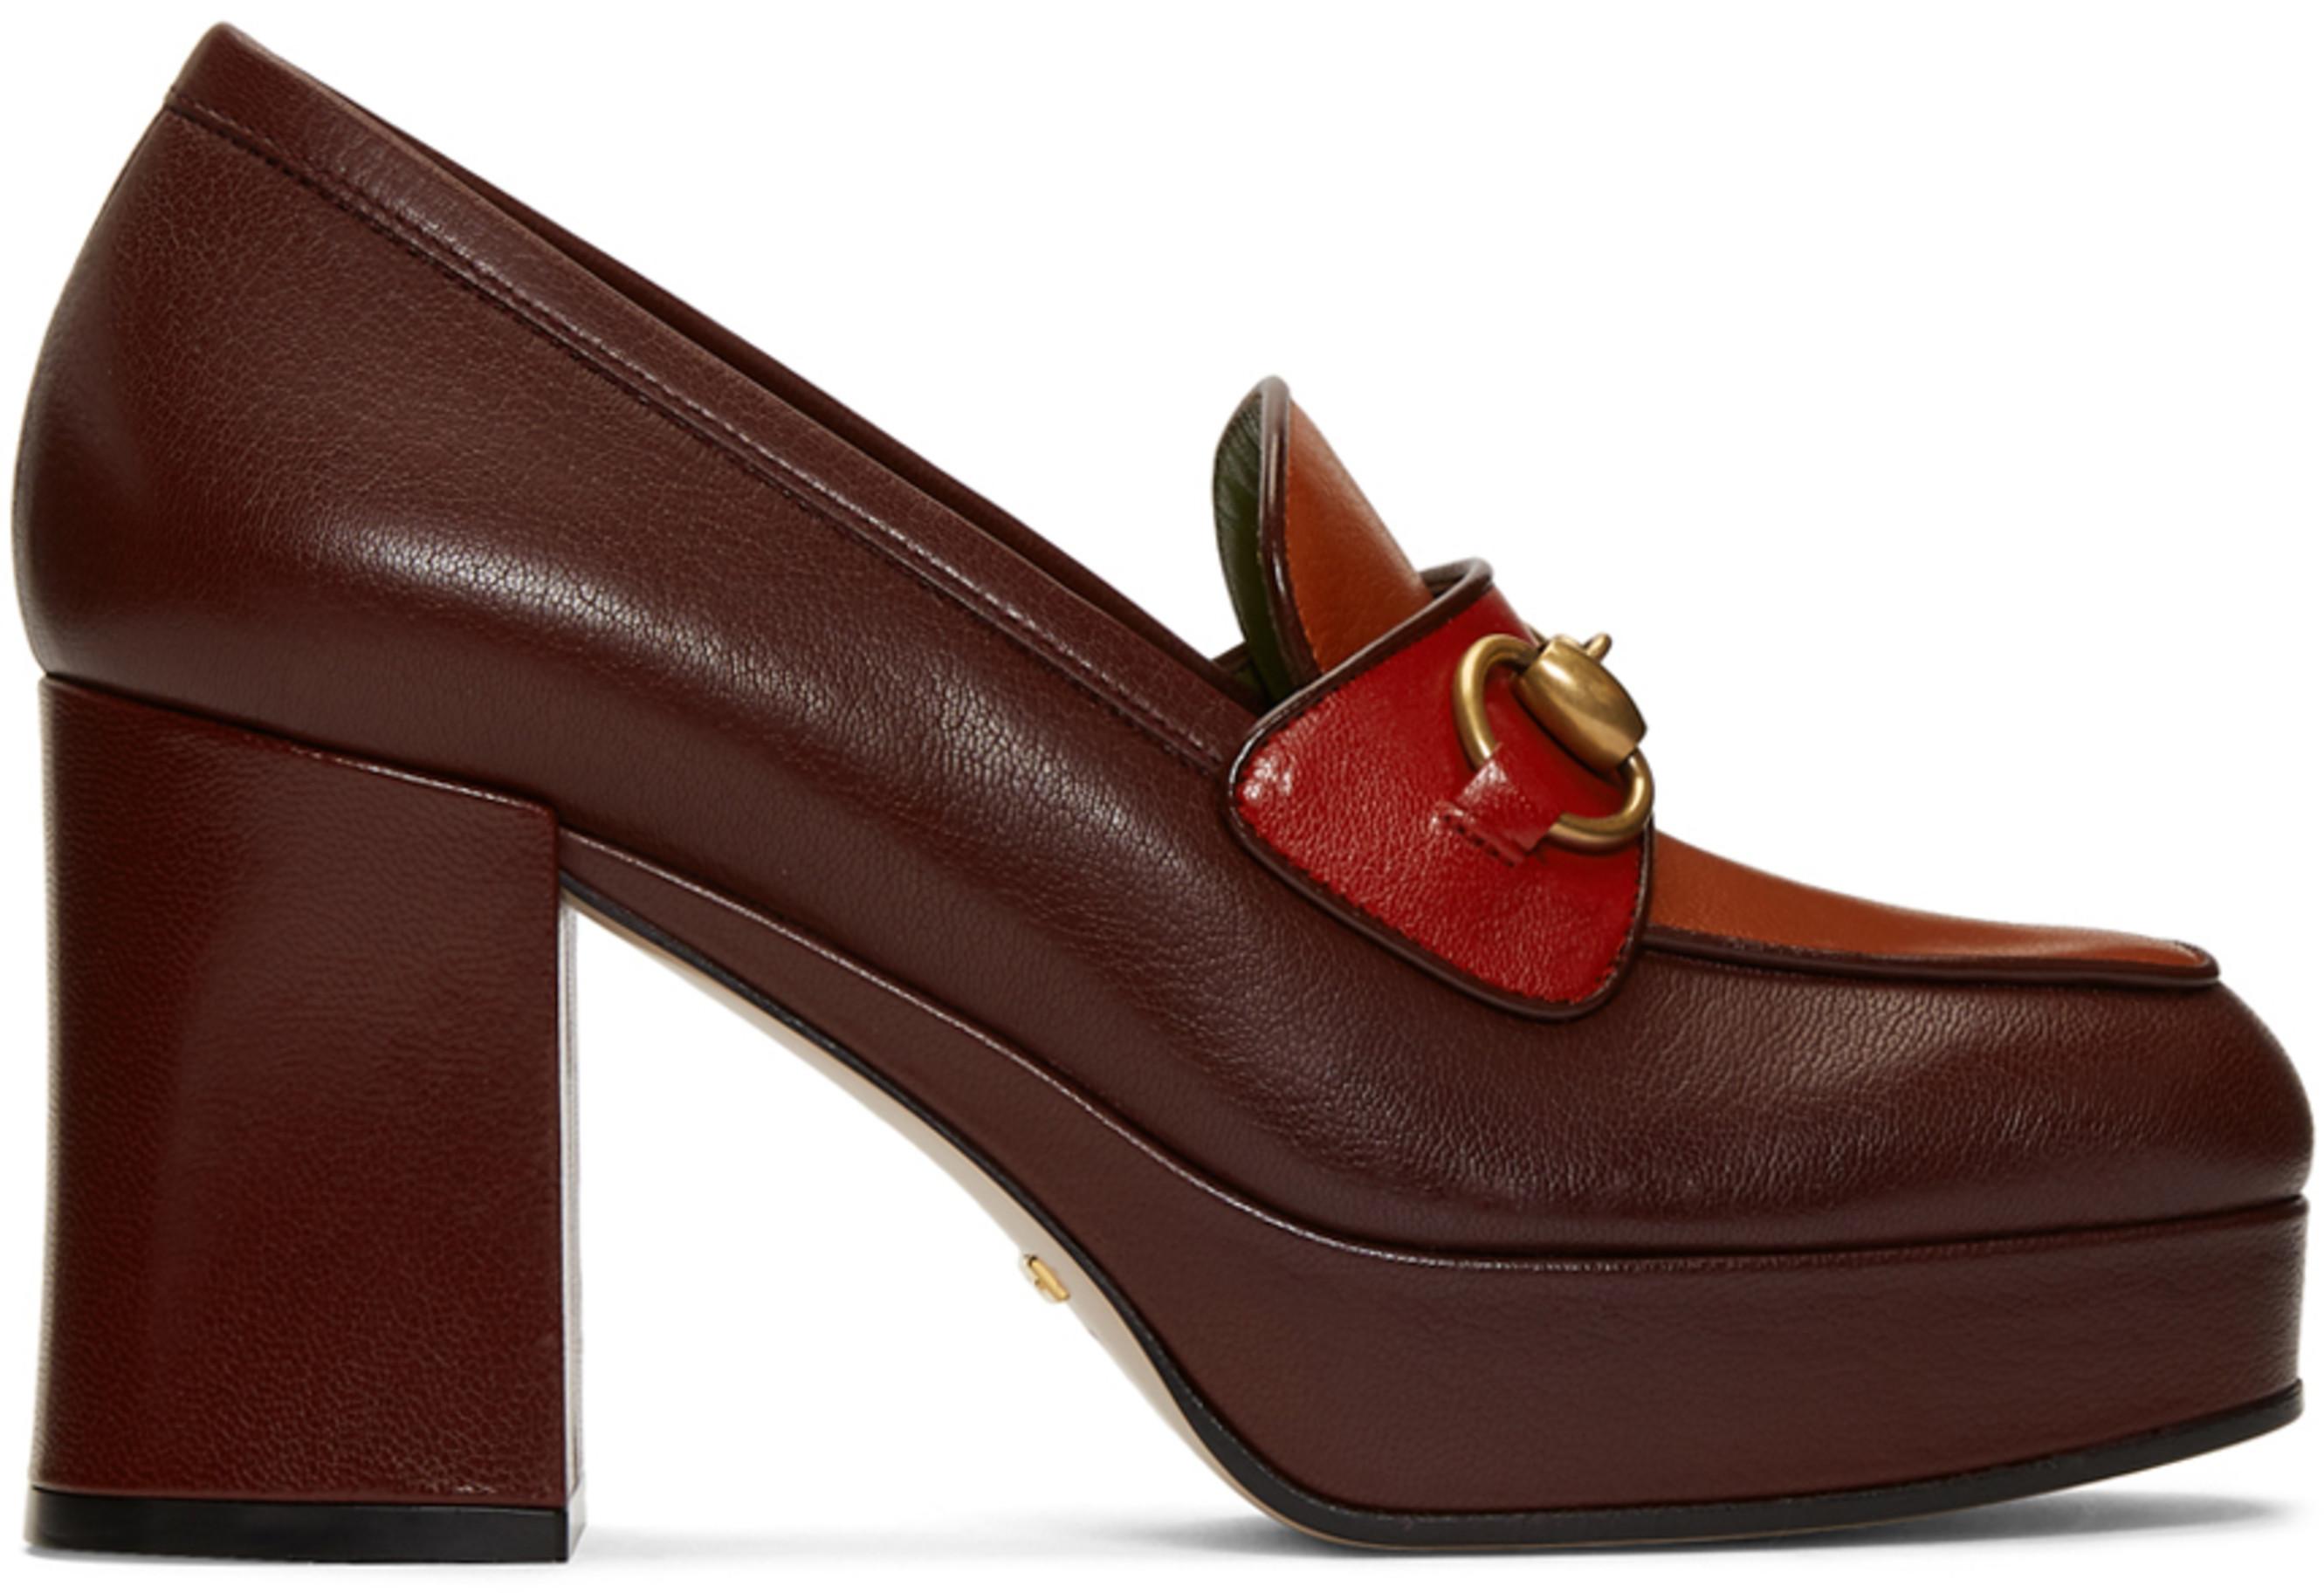 1b2d6efc353 Gucci shoes for Women